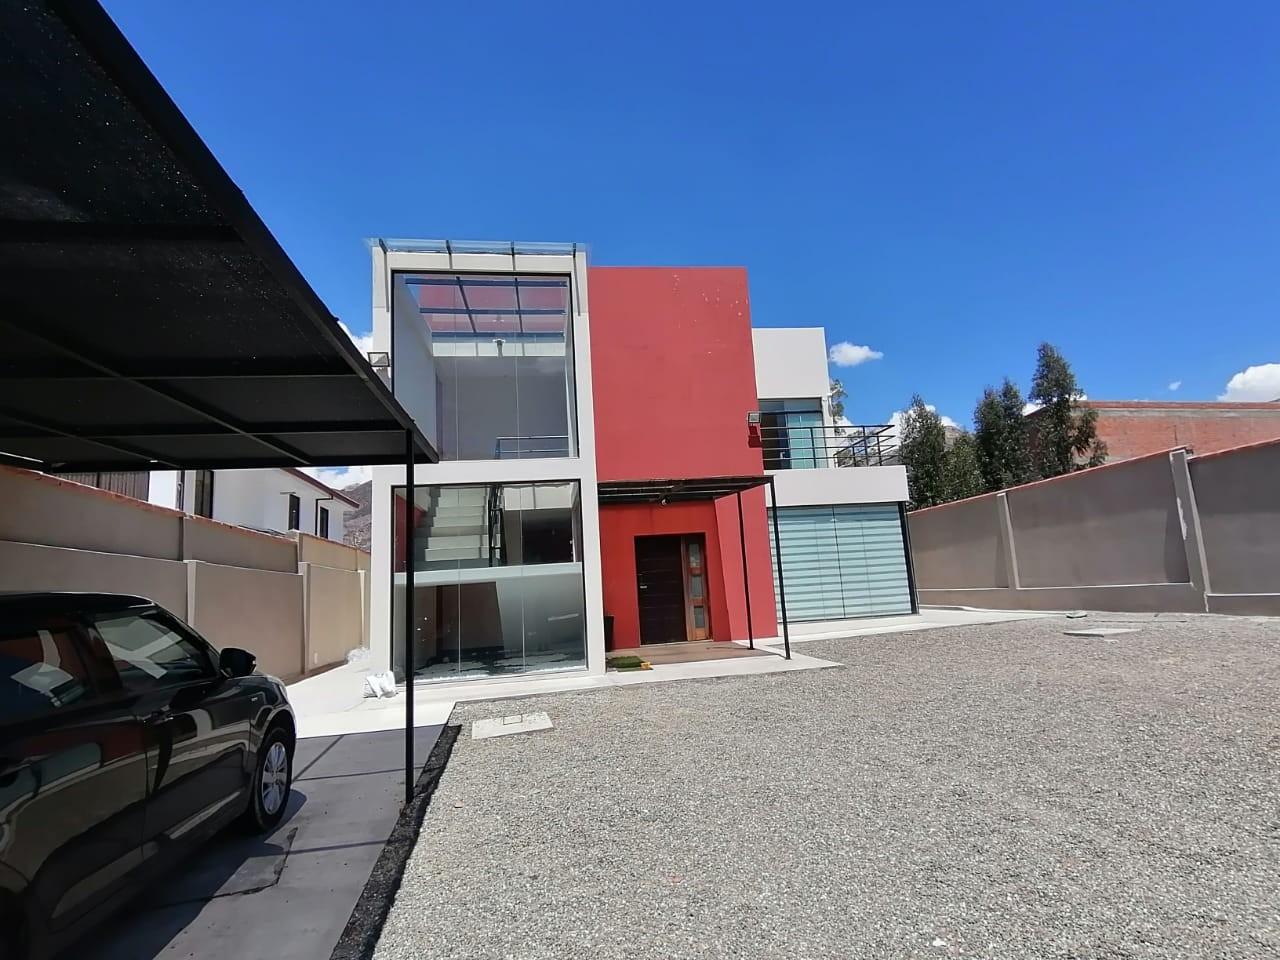 Casa en Venta $us.250.000.- LINDA CASA EN VENTA JUPAPINA 653 mtrs DE TERRENO LPZ Foto 18